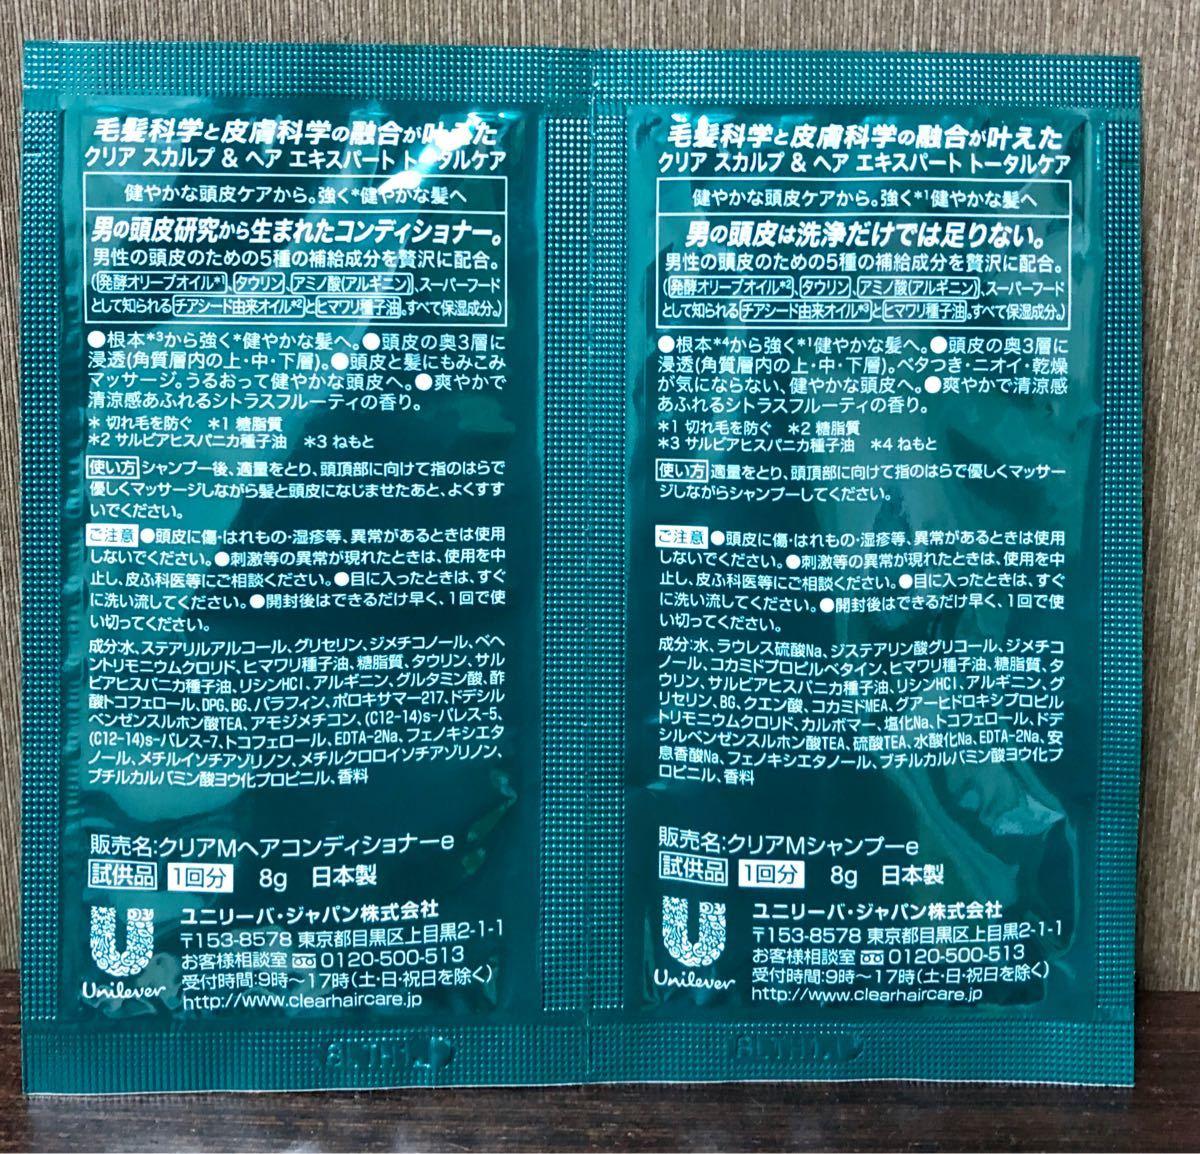 CLEAR トータルケア スカルプシャンプー&コンディショナー サンプル各1回分 【即日発送】